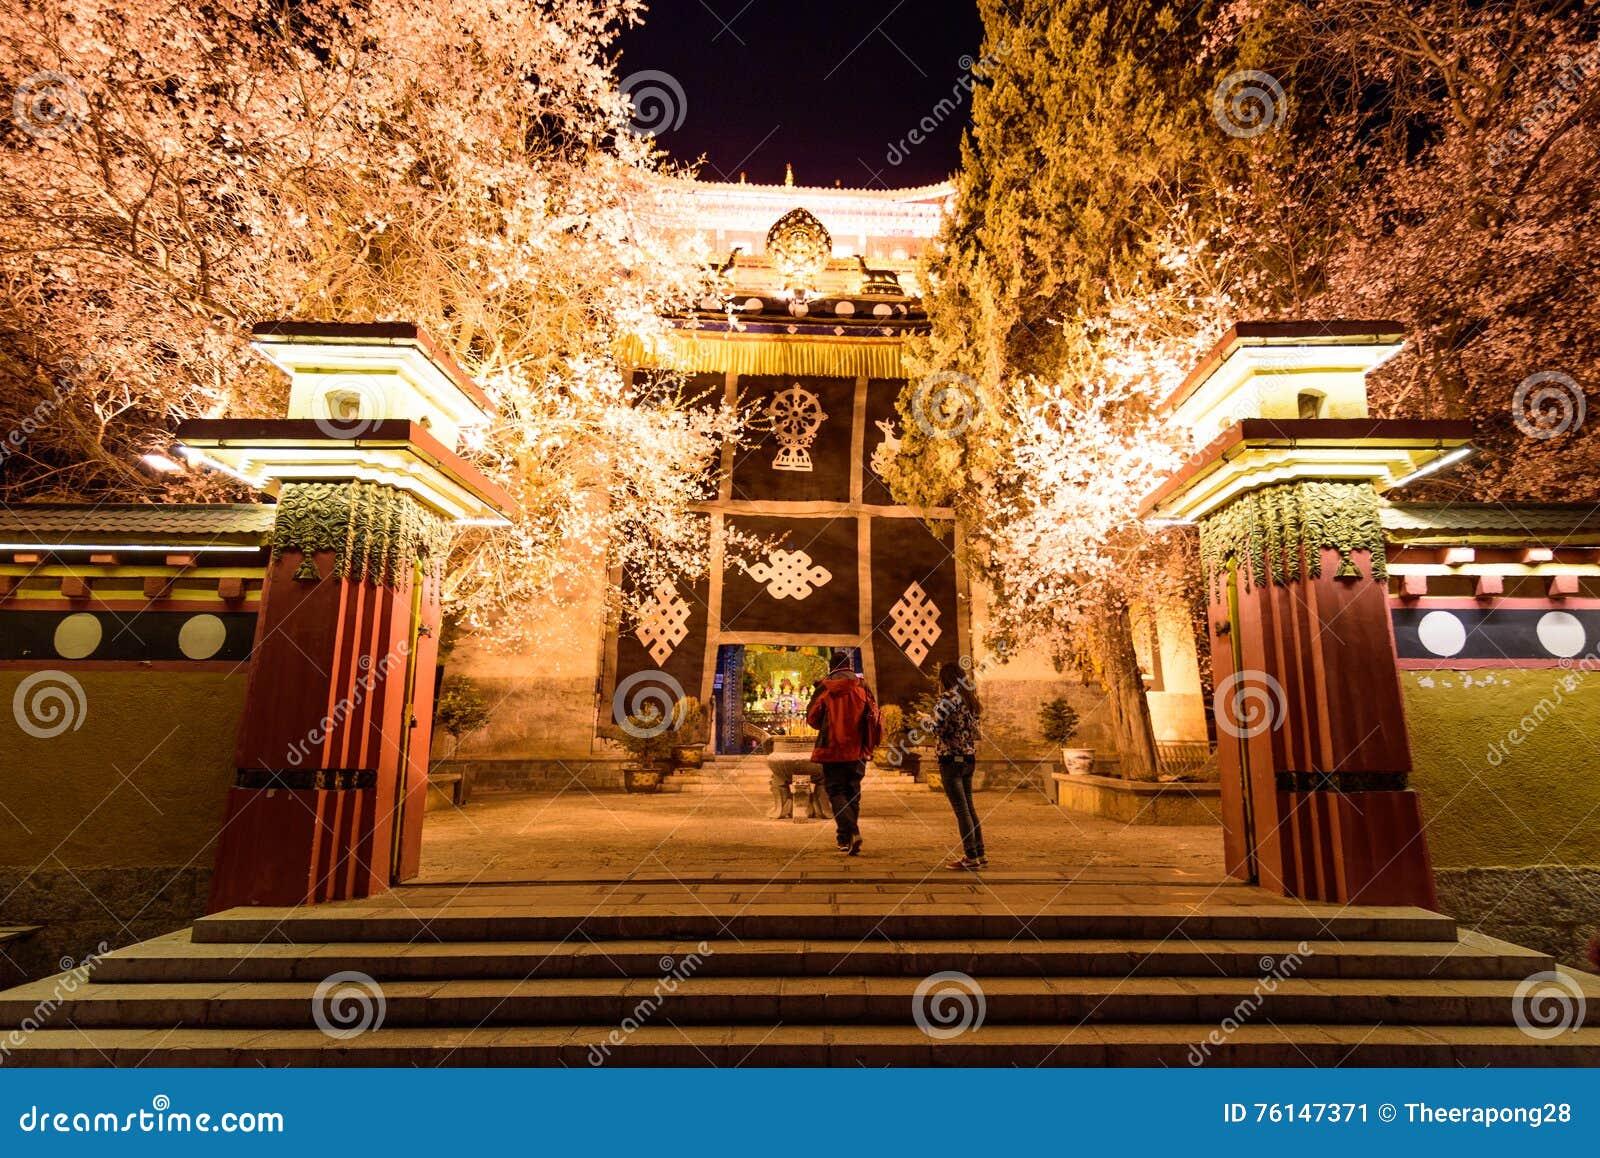 Luces de la noche del templo en Shangri-La, China